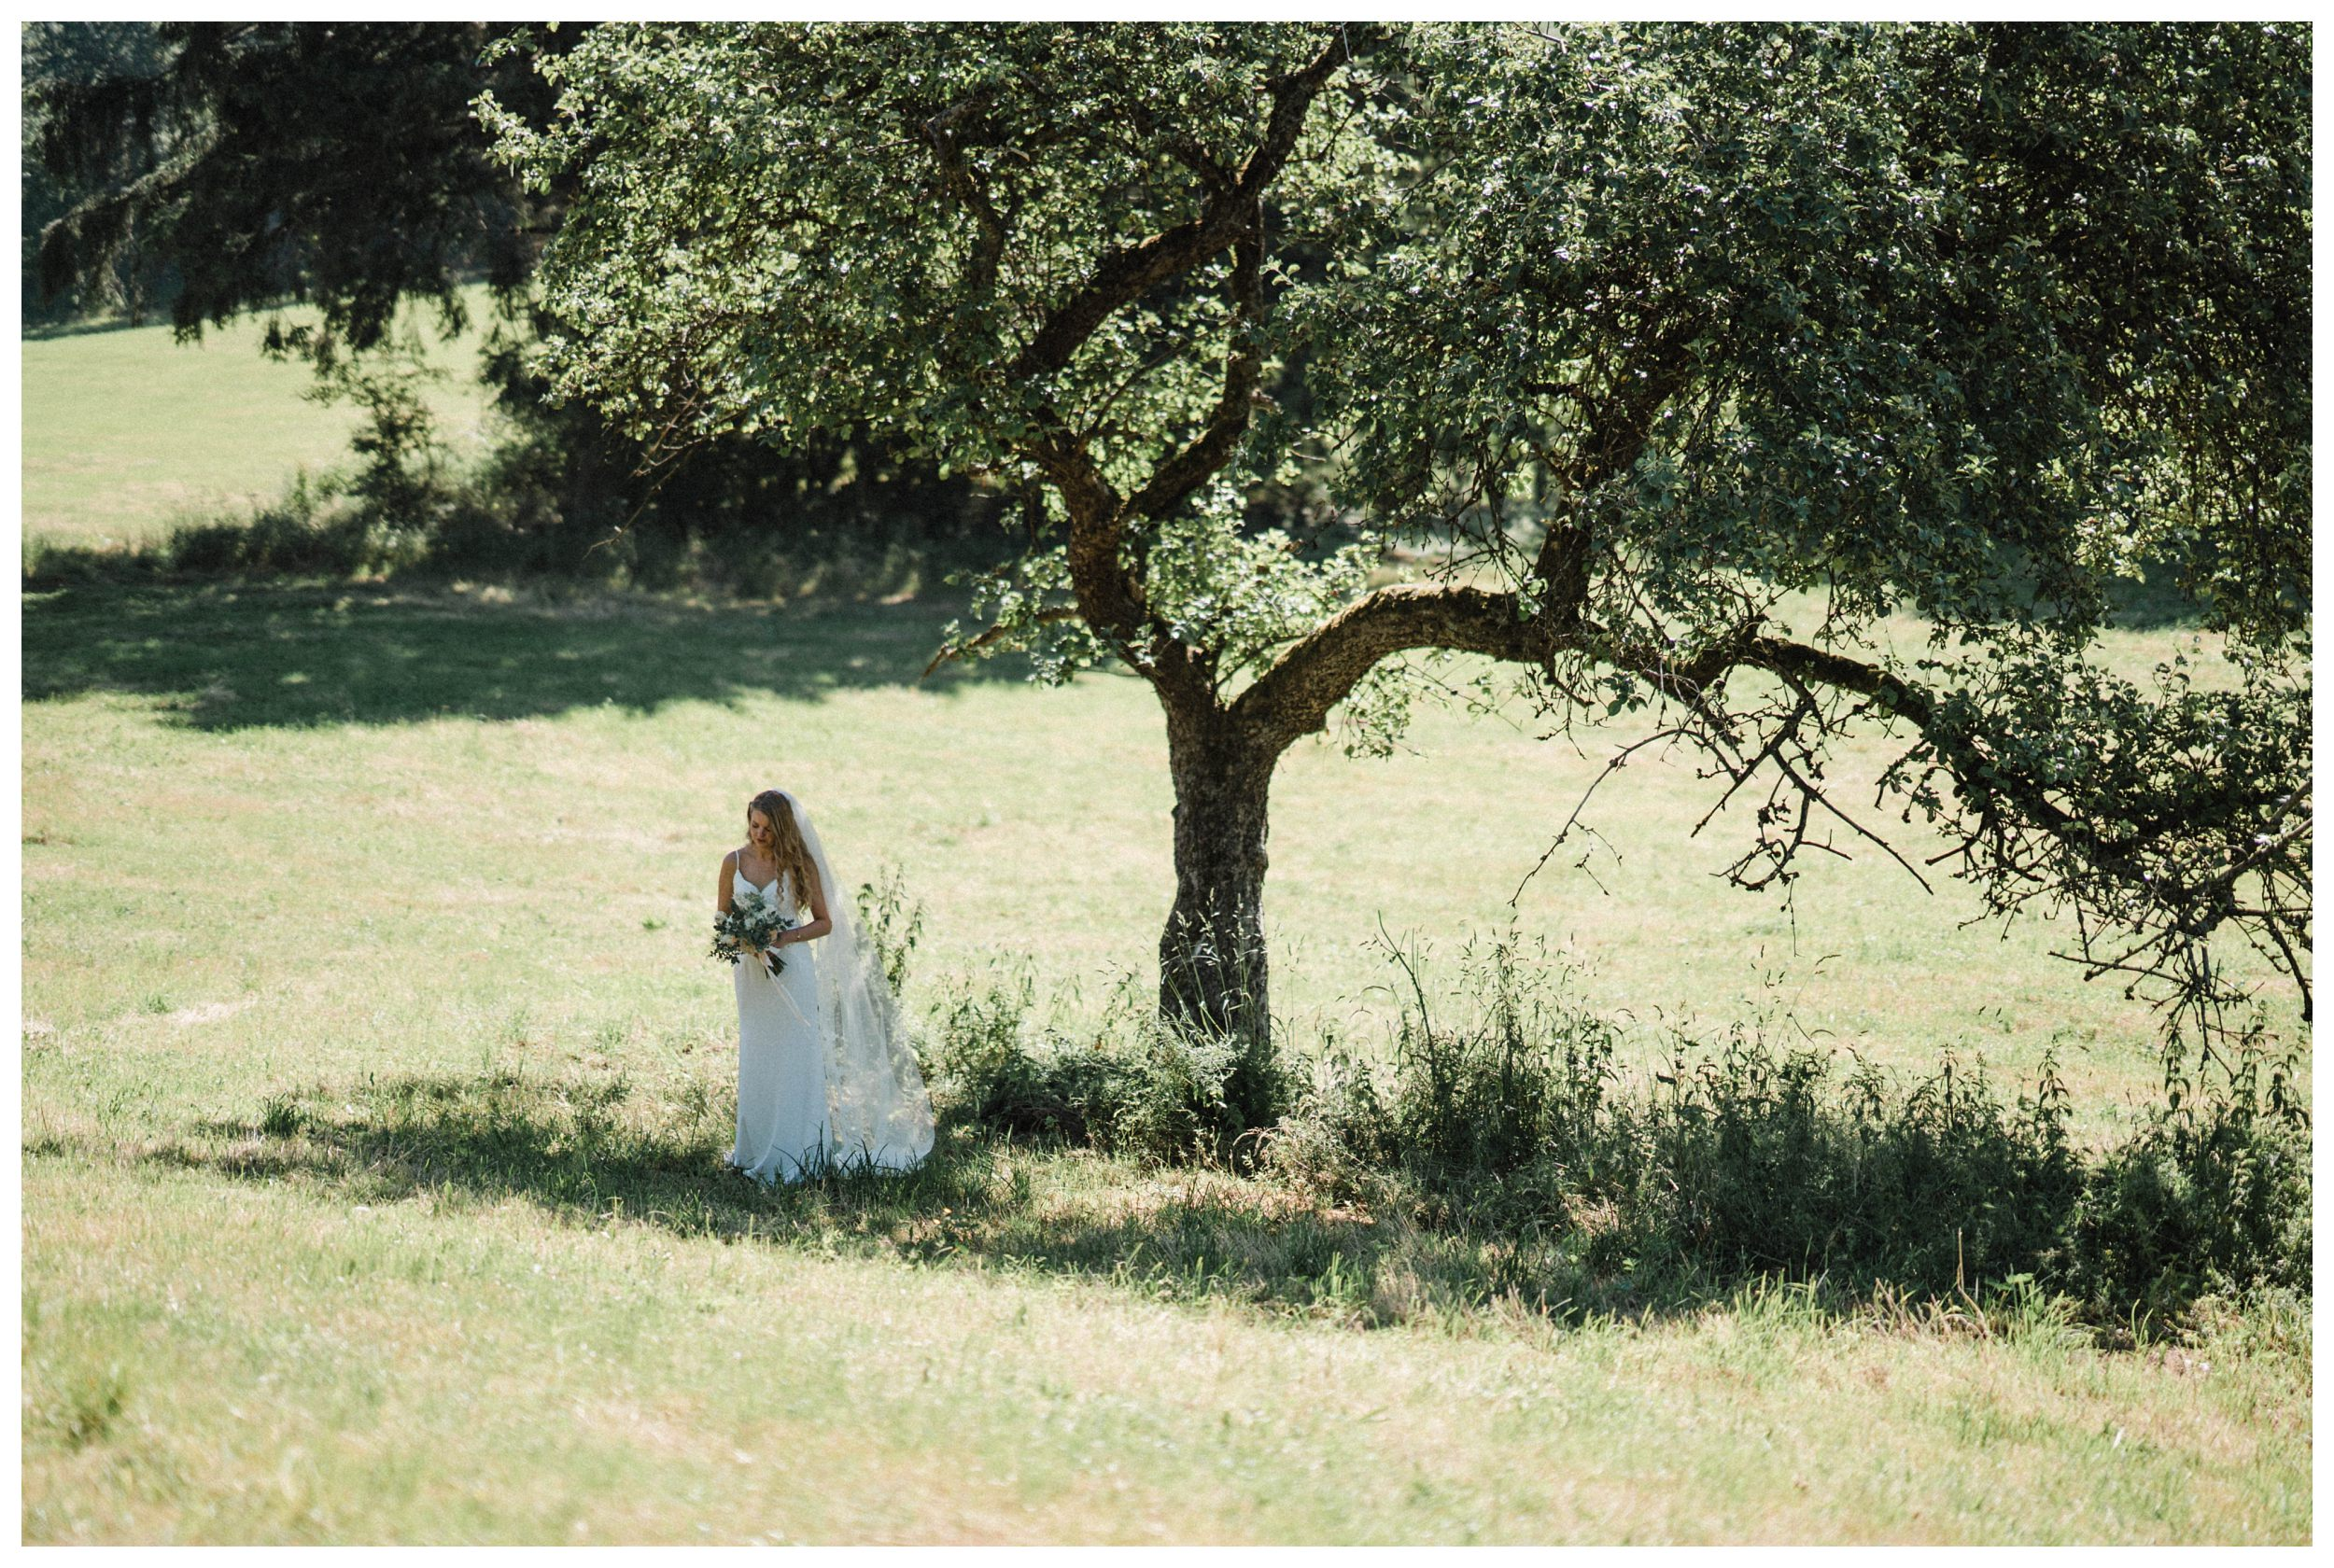 huwelijksfotograaf bruidsfotograaf destinationwedding huwelijksfotografie in ardennen nederland (42).jpg